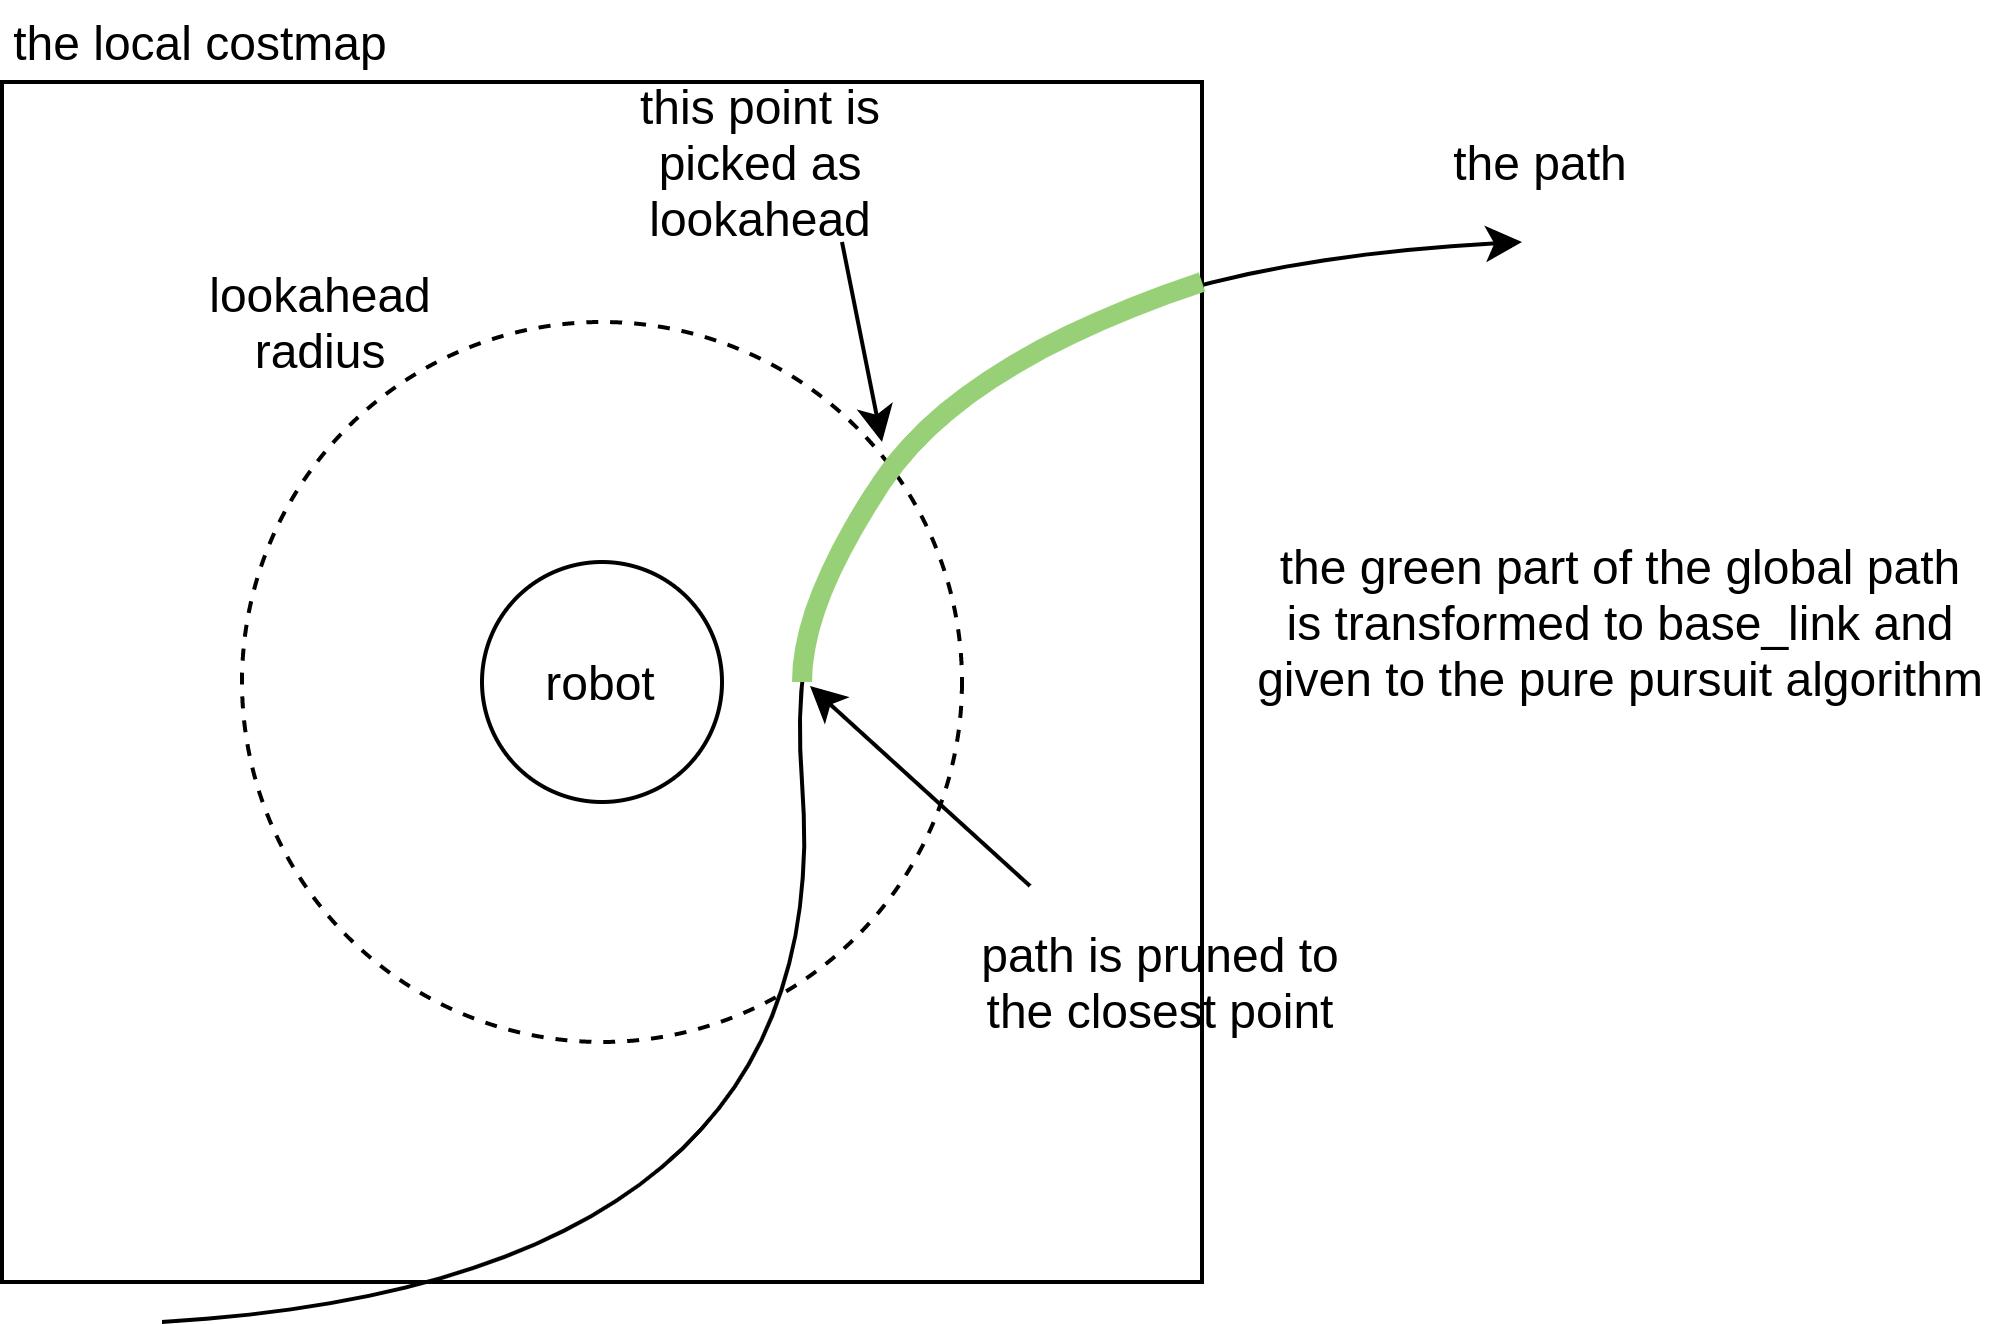 Lookahead algorithm